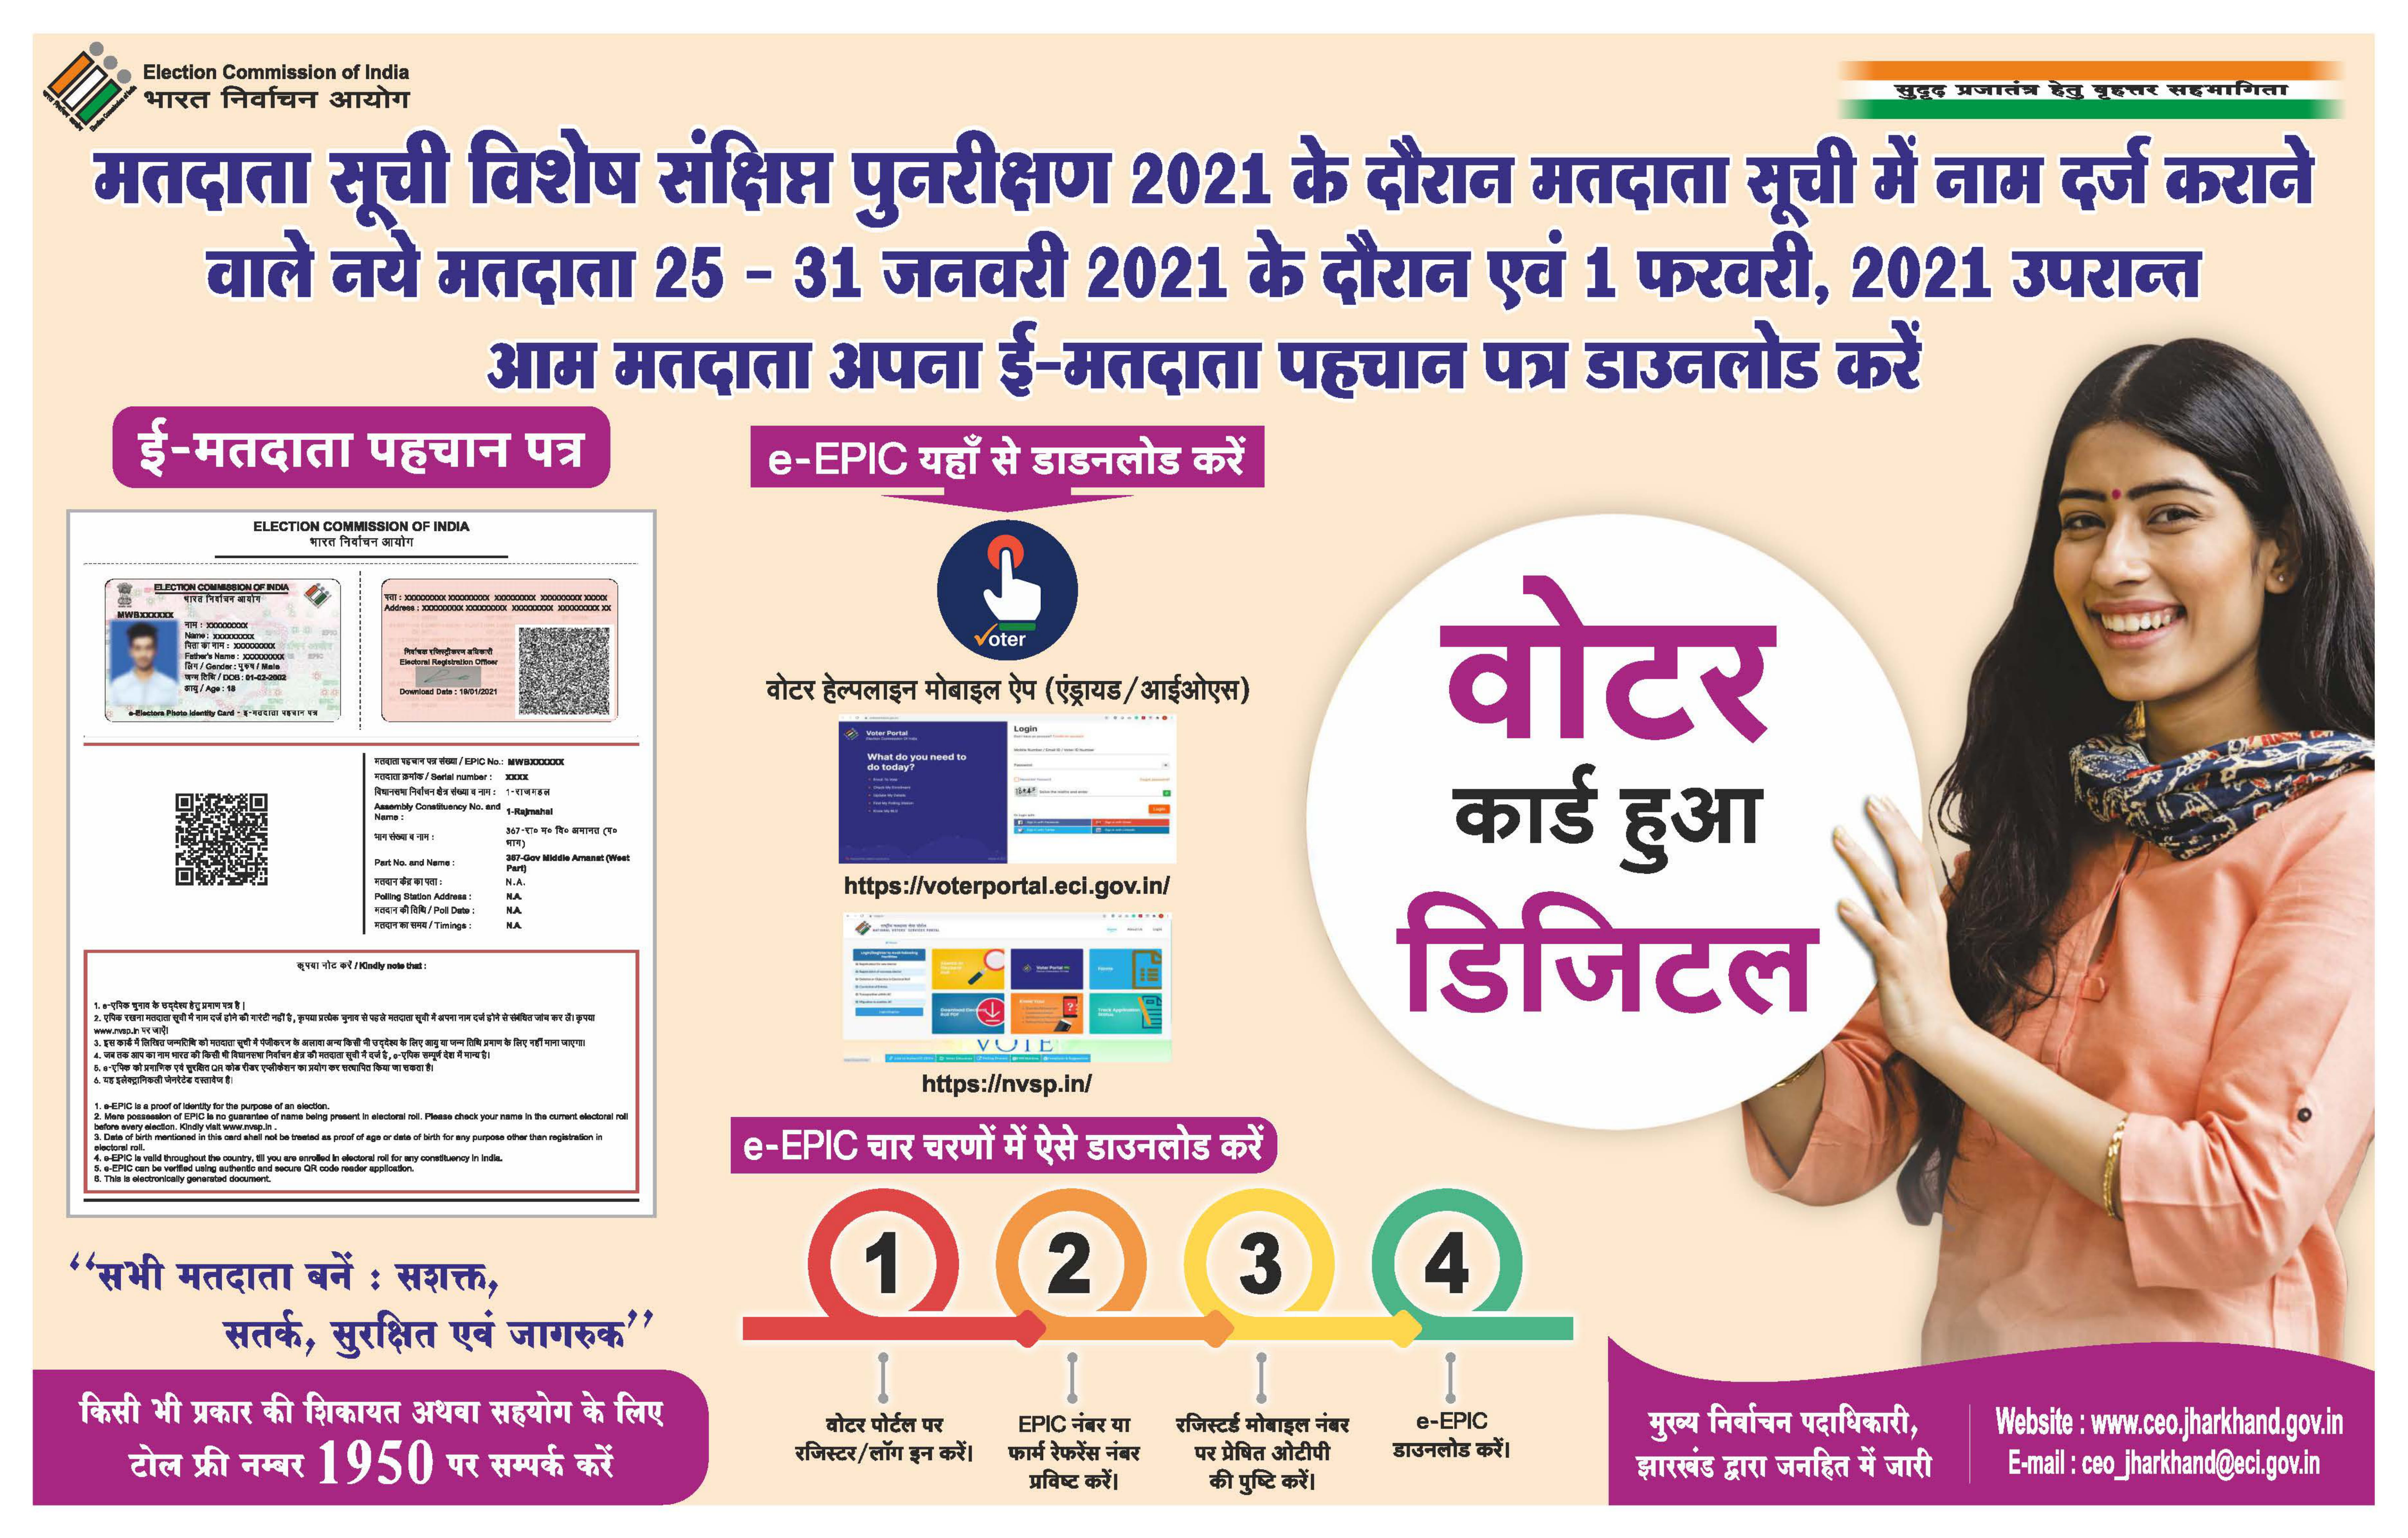 Digital Voter